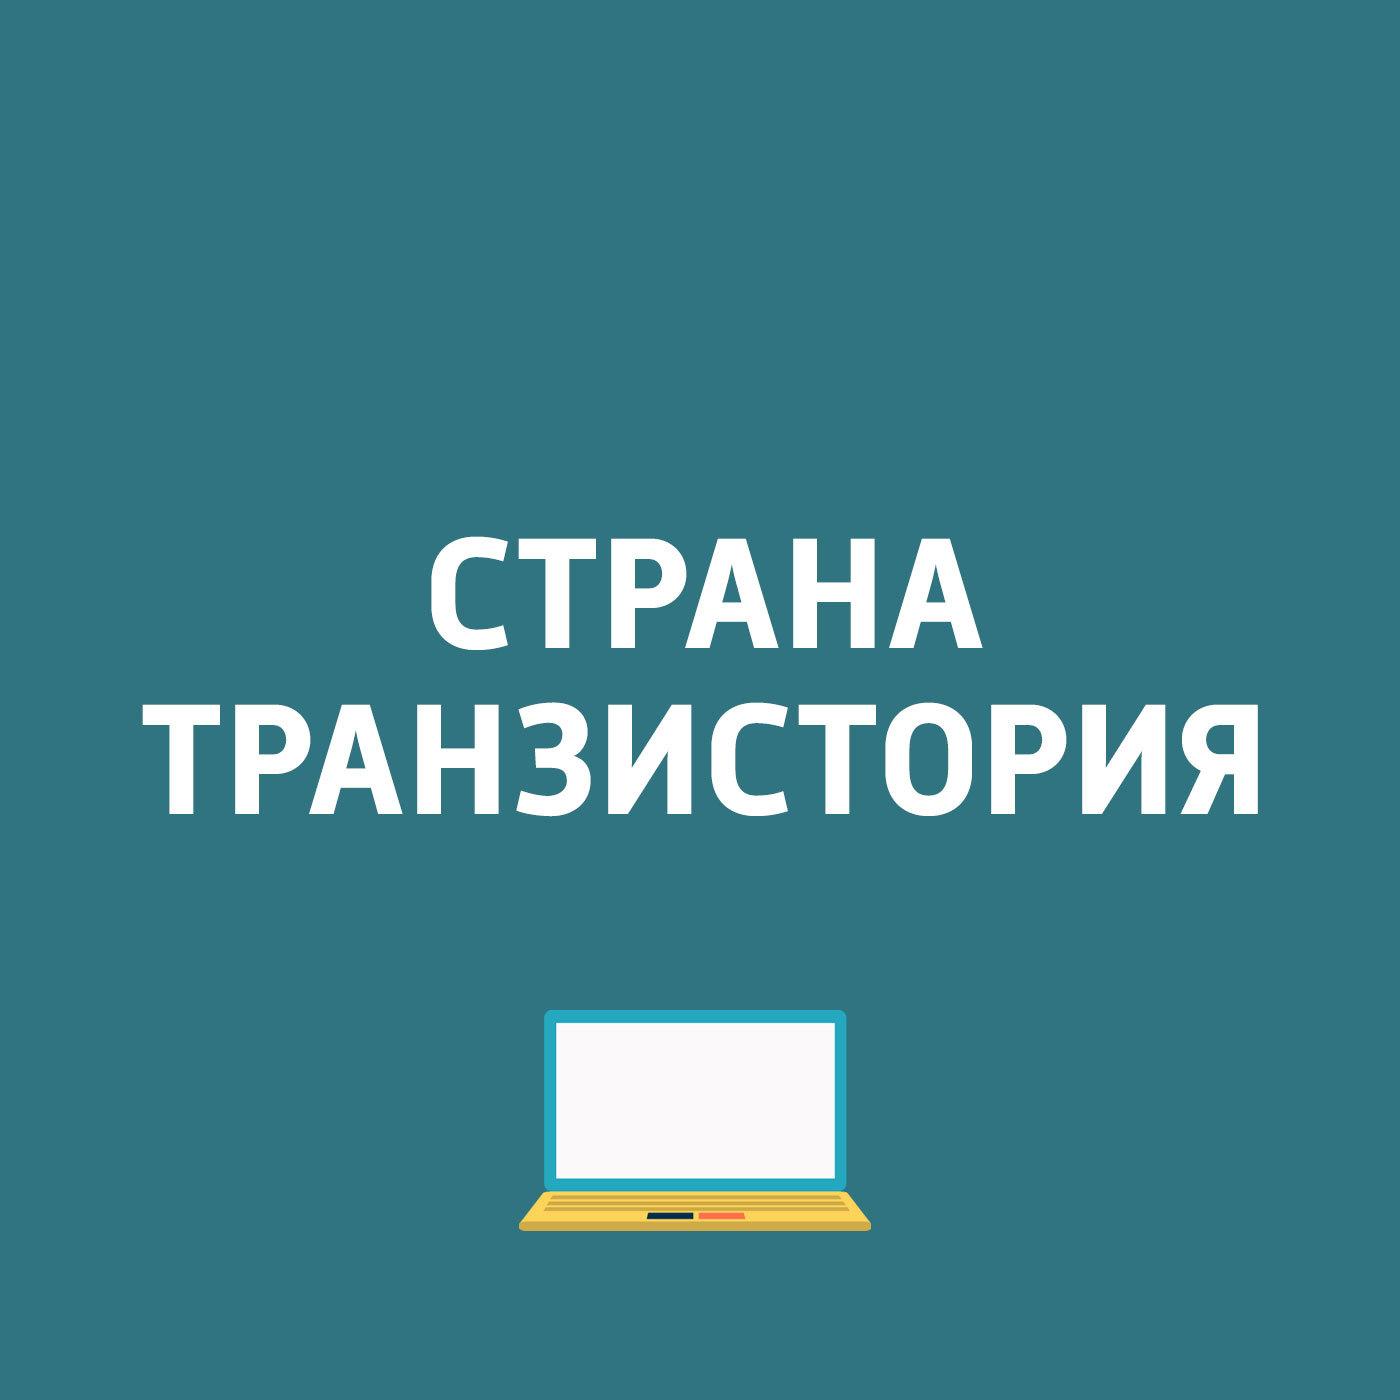 Картаев Павел World of Tanks, Apple Radio, платная музыка в VK